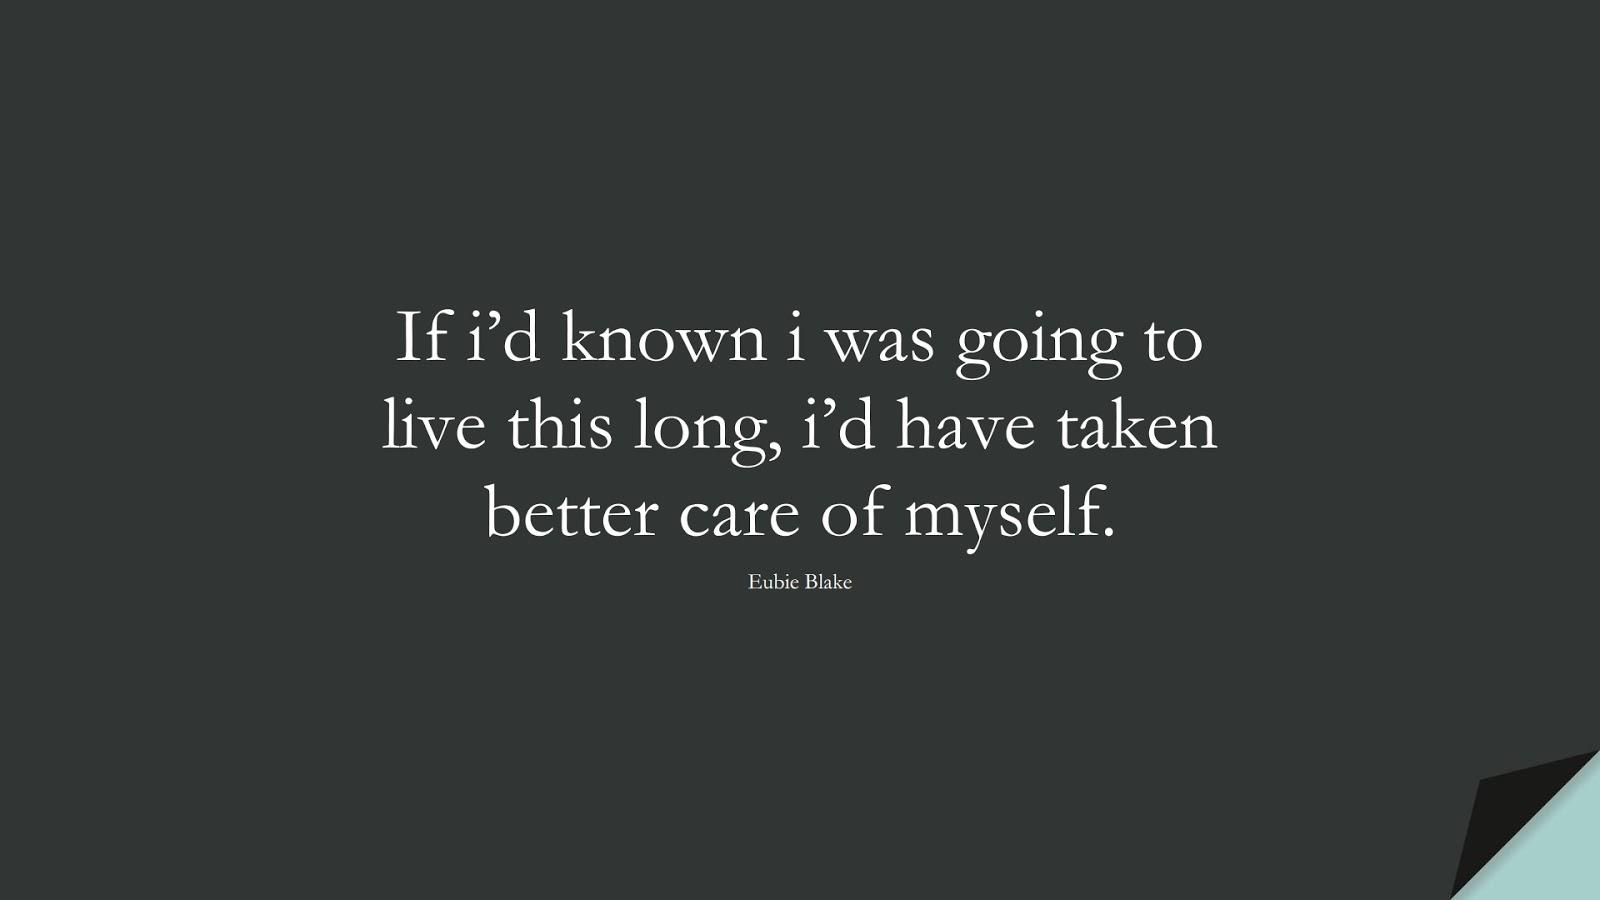 If i'd known i was going to live this long, i'd have taken better care of myself. (Eubie Blake);  #HealthQuotes